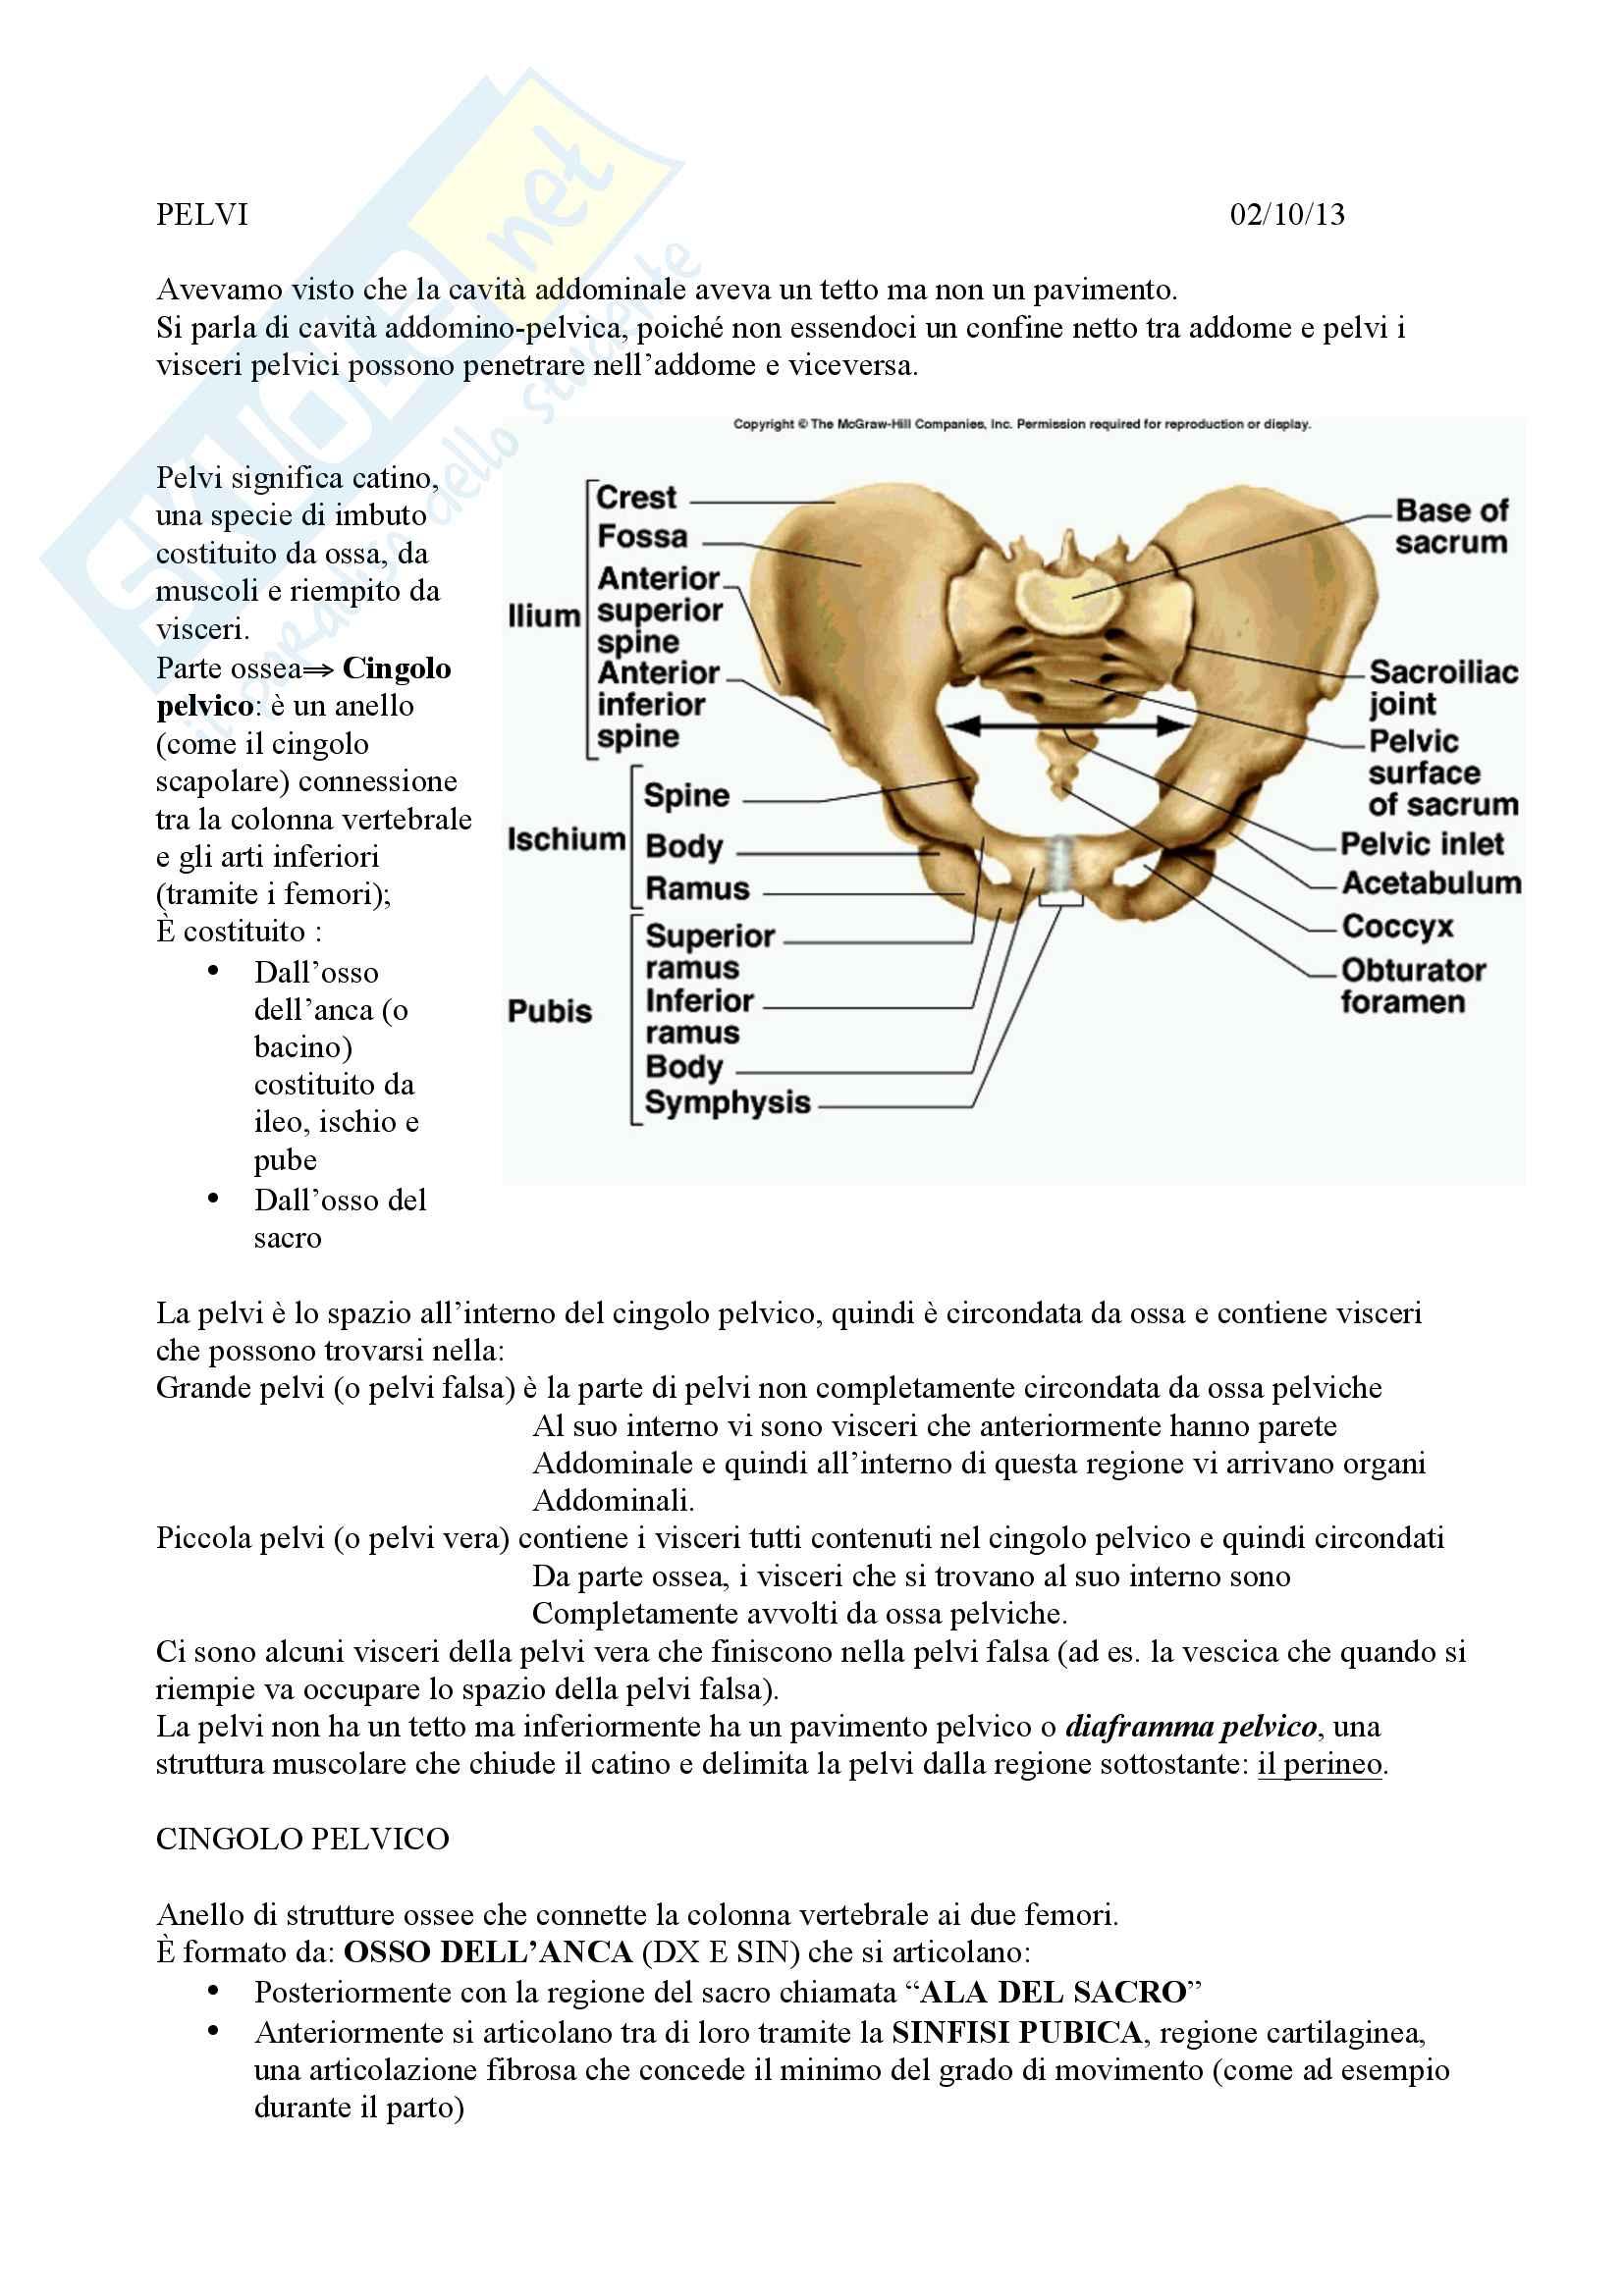 Appunti di Anatomia umana - Pelvi e riproduzione